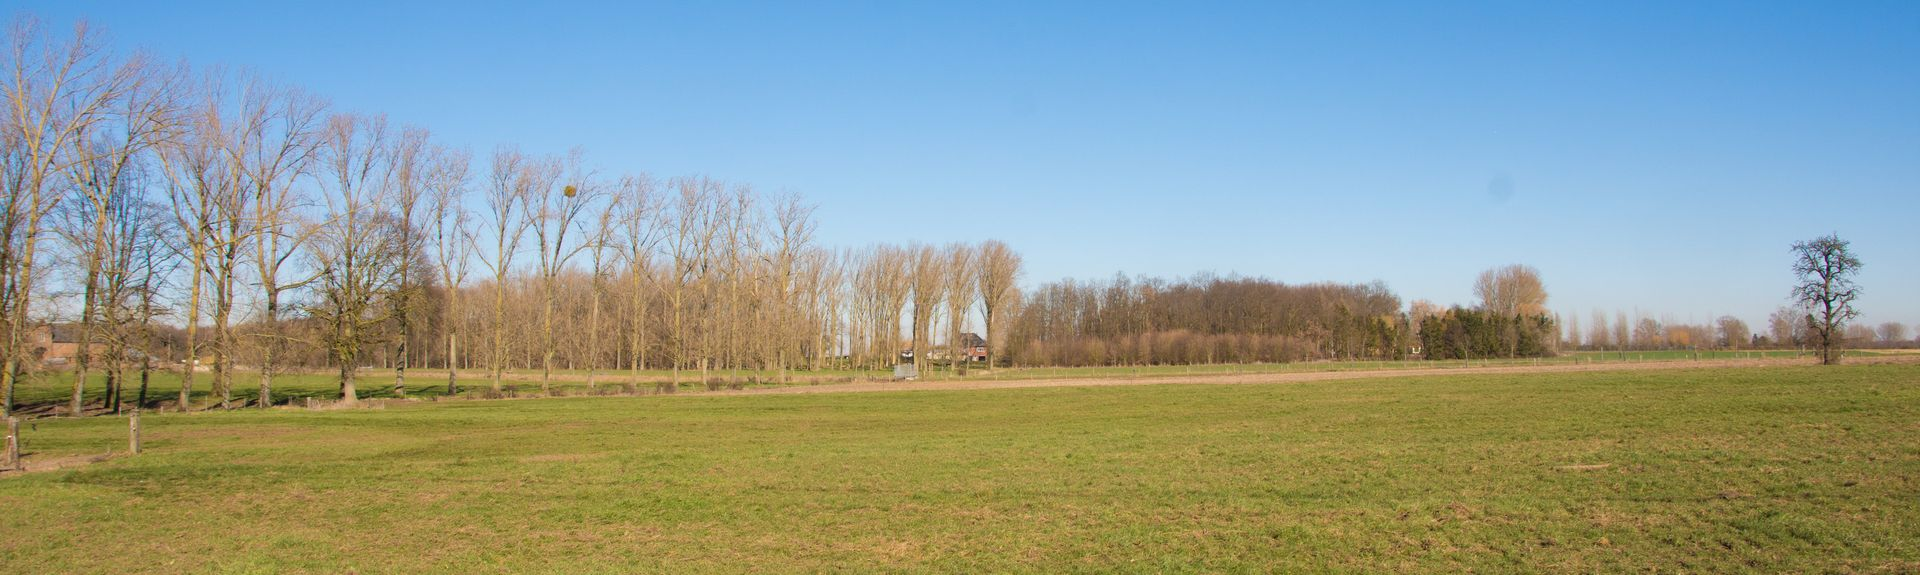 Lummen, Den flamske regionen, Belgia